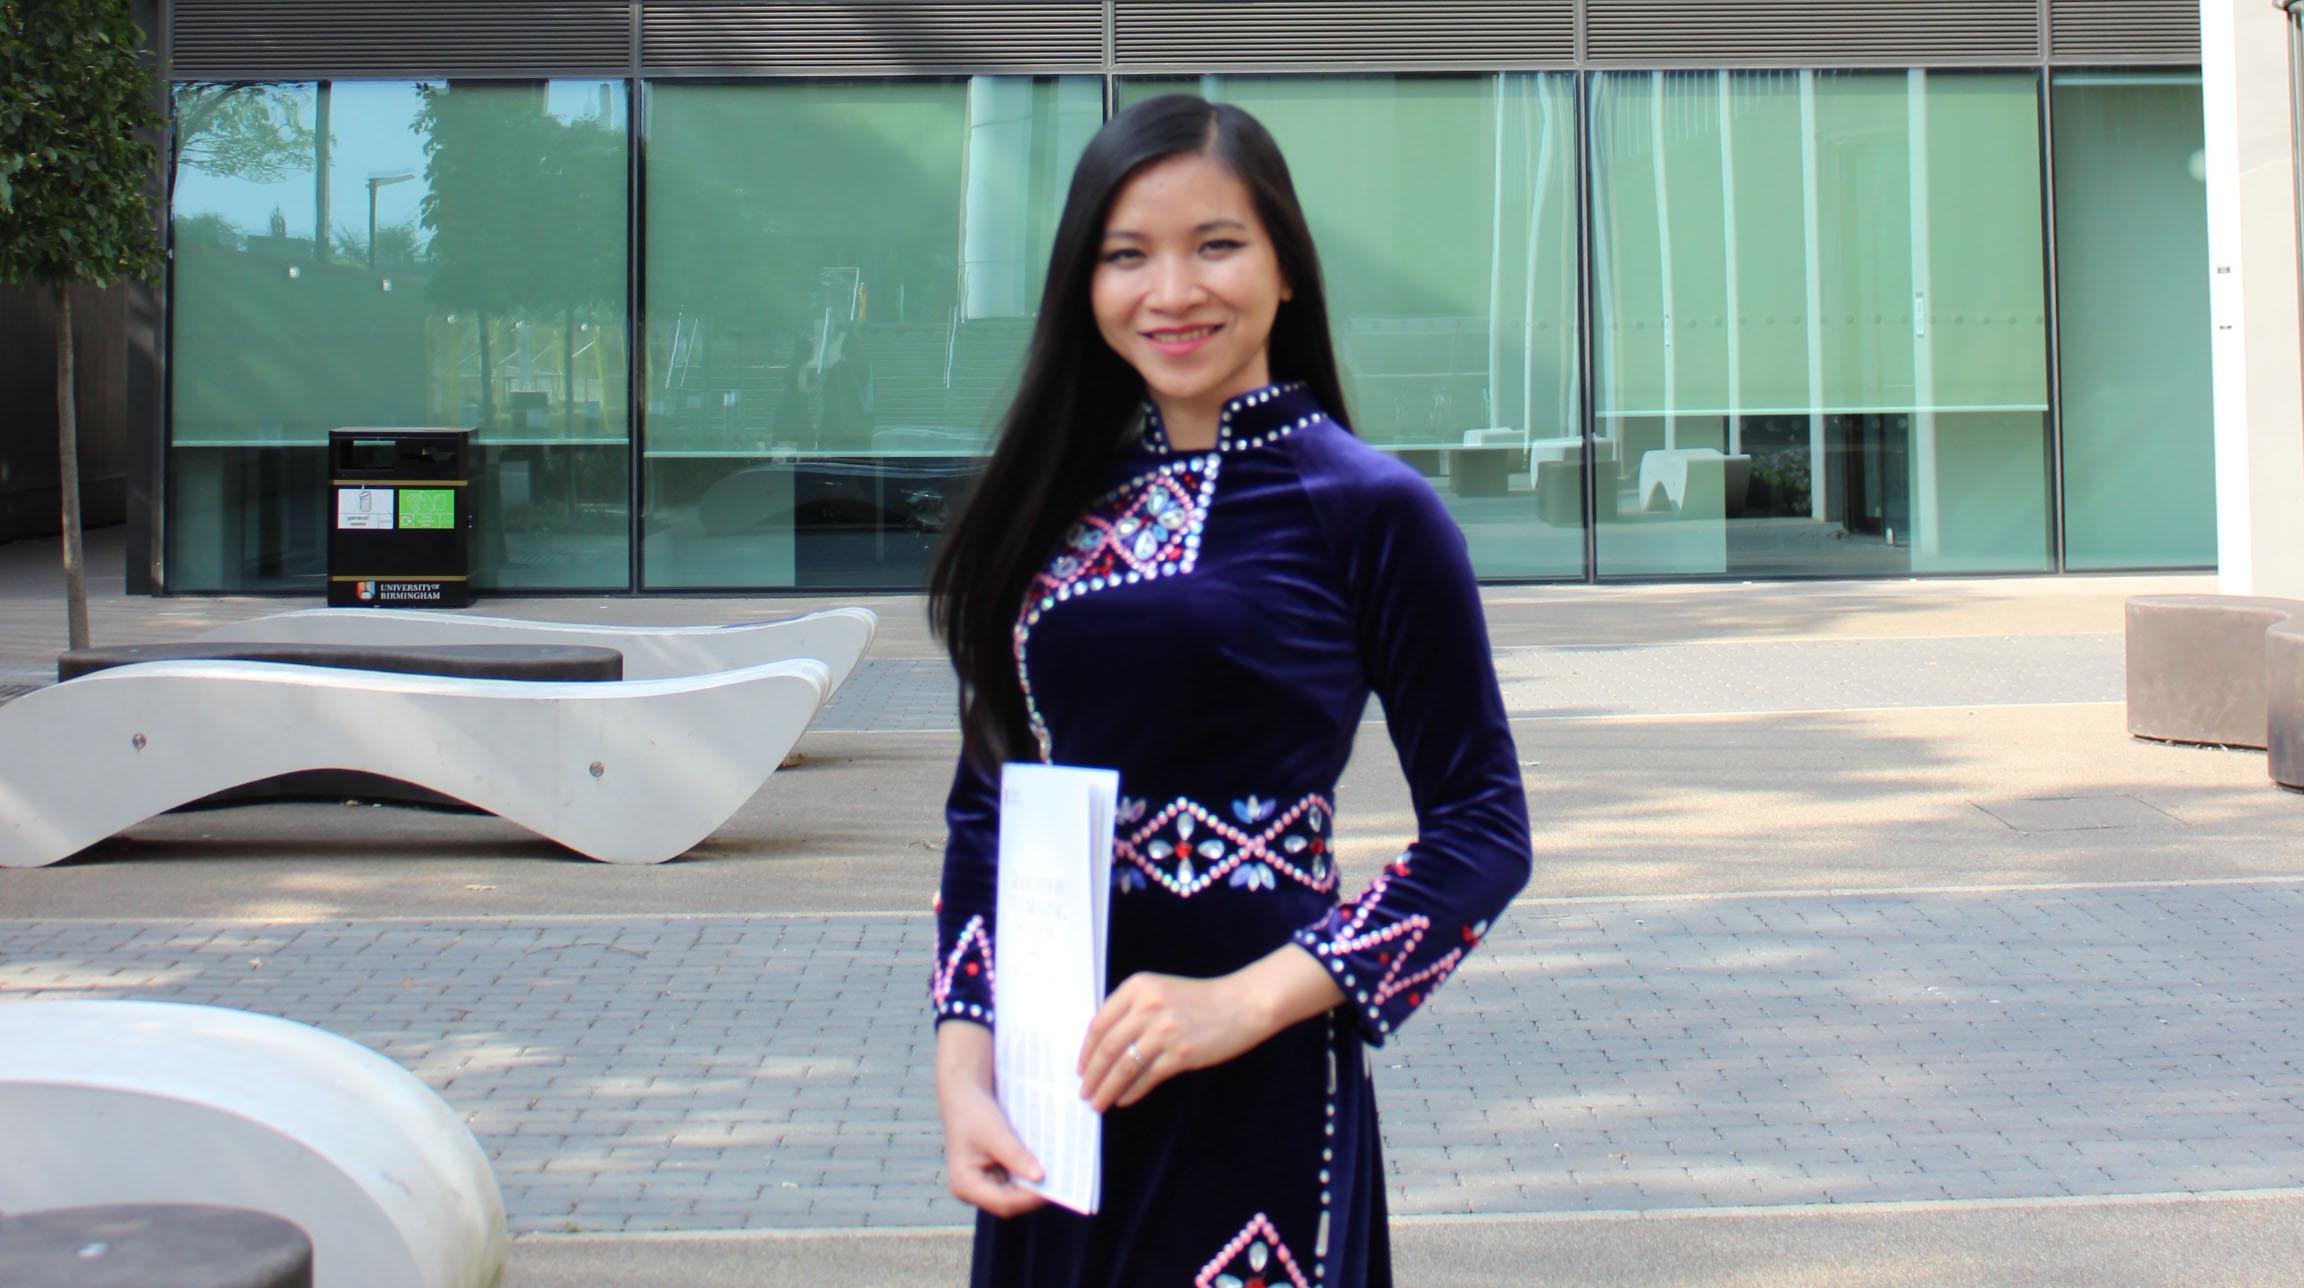 Dr Emily Ngan Luong on having grit